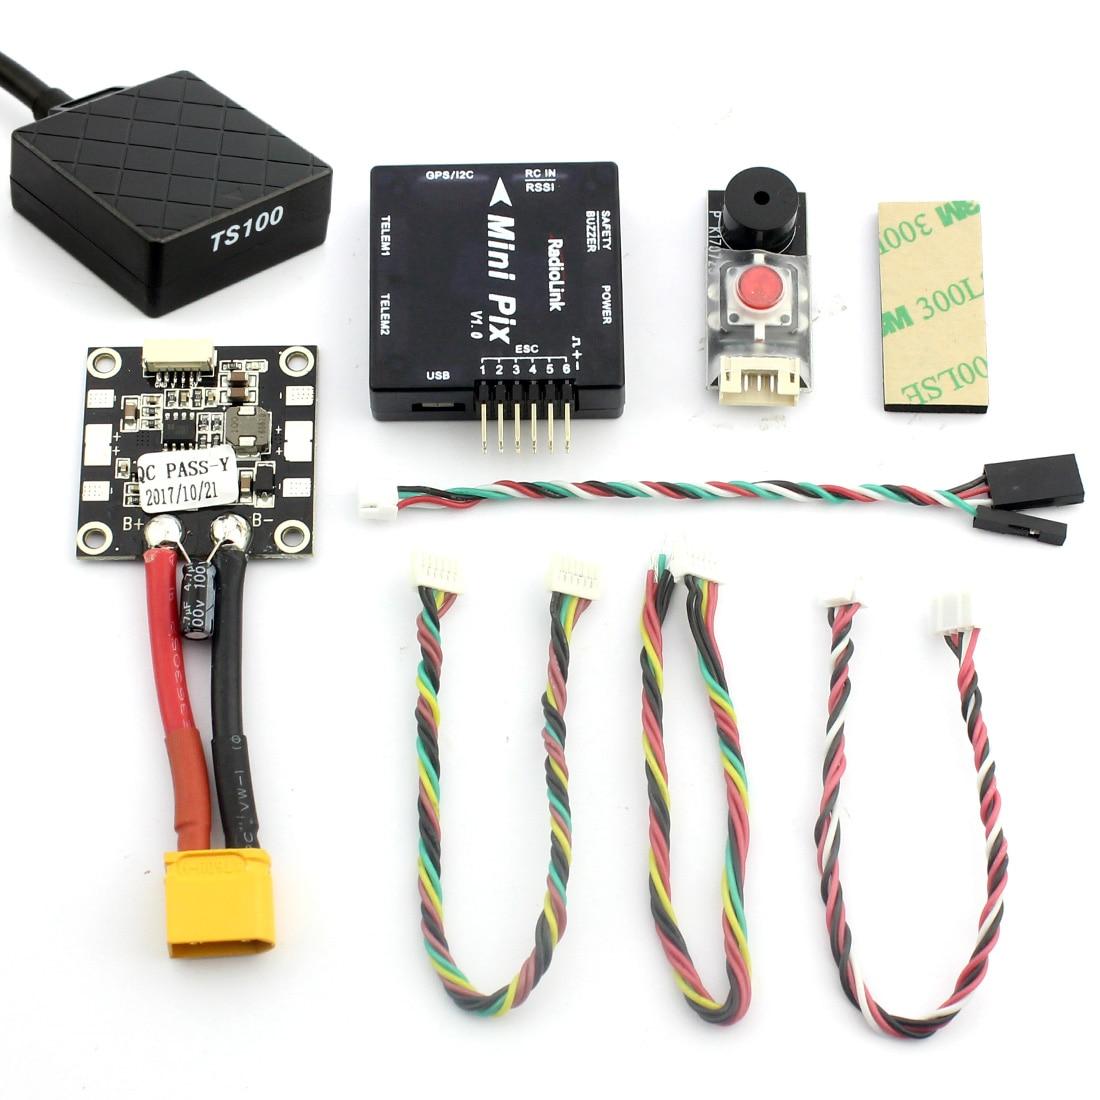 Pro DIY F450 F550 Drone Full Set 2.4G 10CH RC Hexacopter Quadcopter Radiolink Mini PIX M8N GPS PIXHAWK Altitude Hold FPV Upgrade